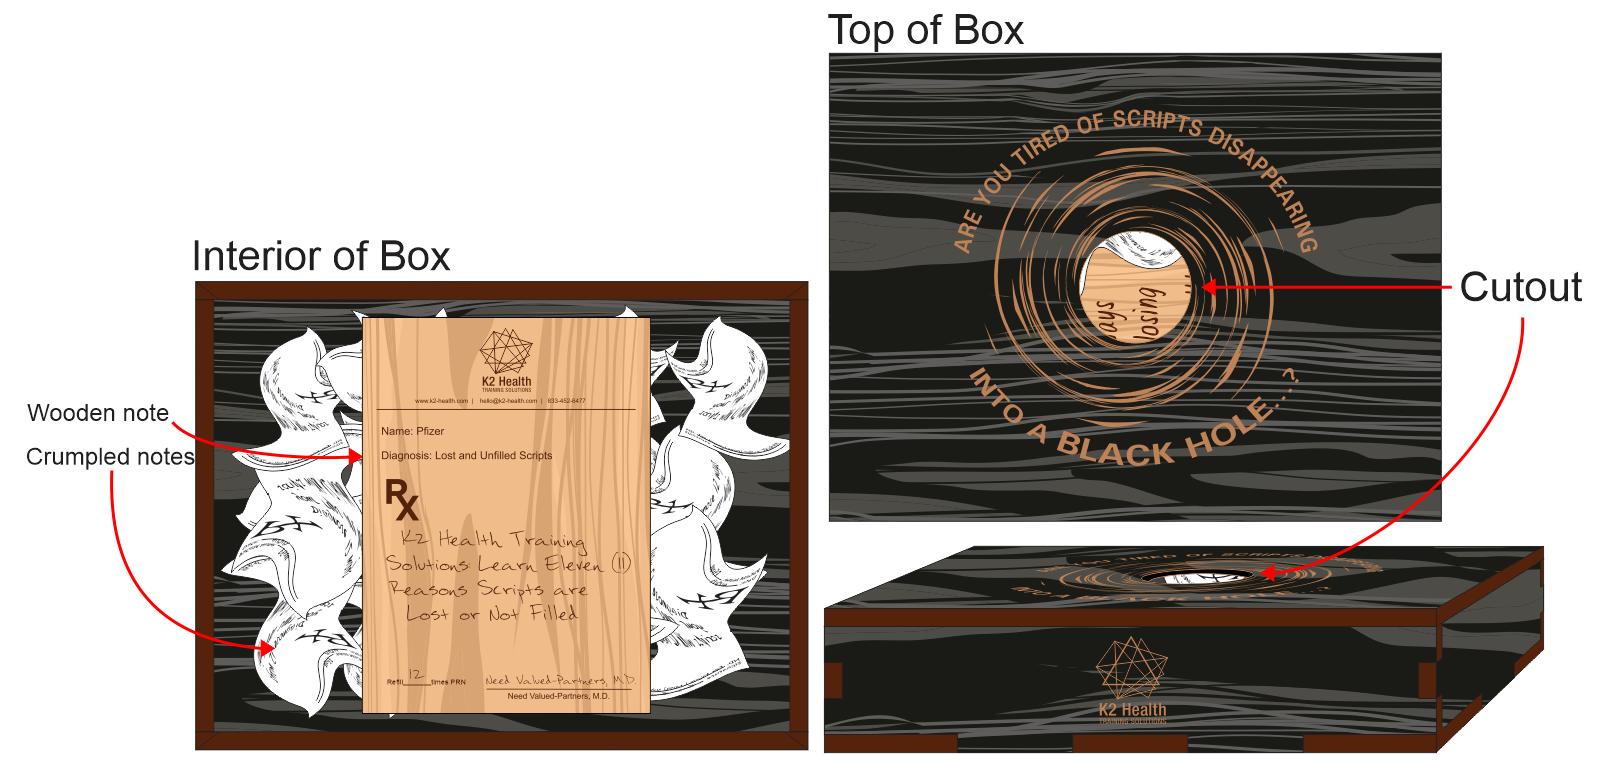 Black Hole Box - $75